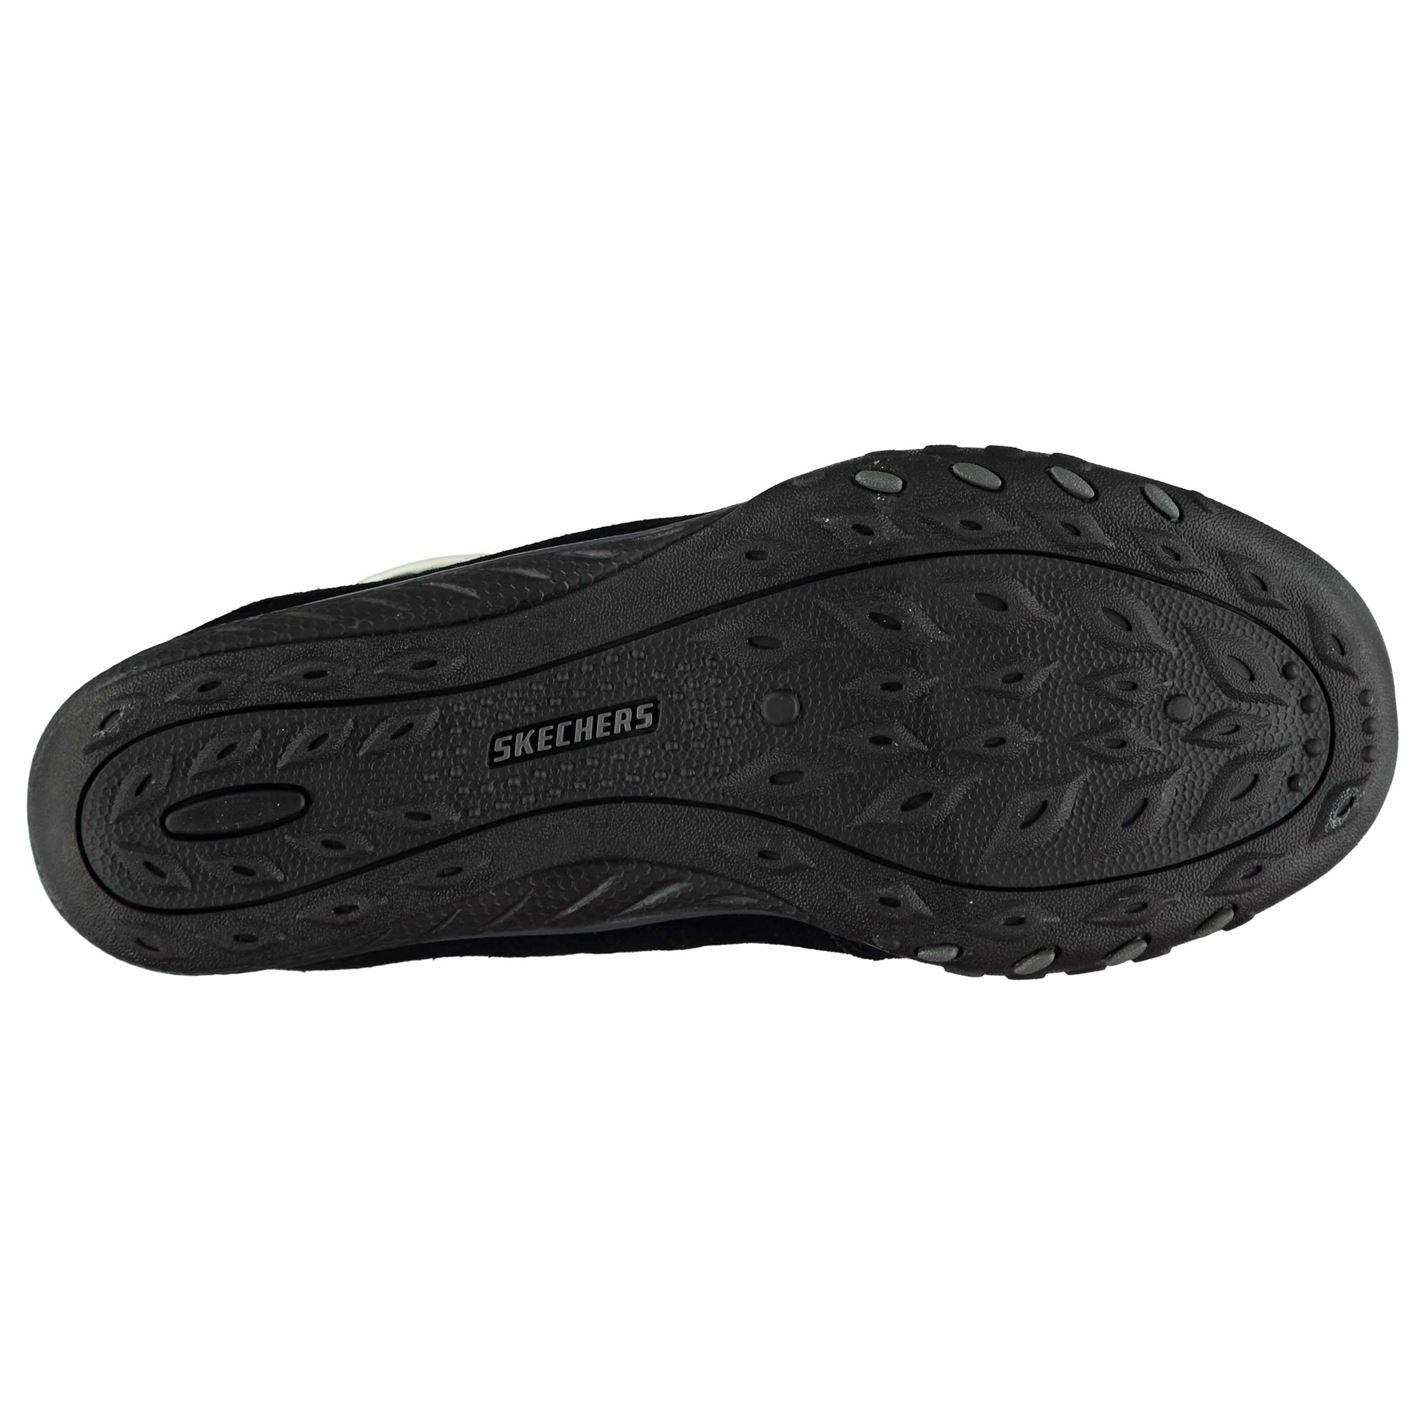 2cf688685 Skechers-Womens-Breathe-Easy-Shoes-Casual-Memory-Foam thumbnail